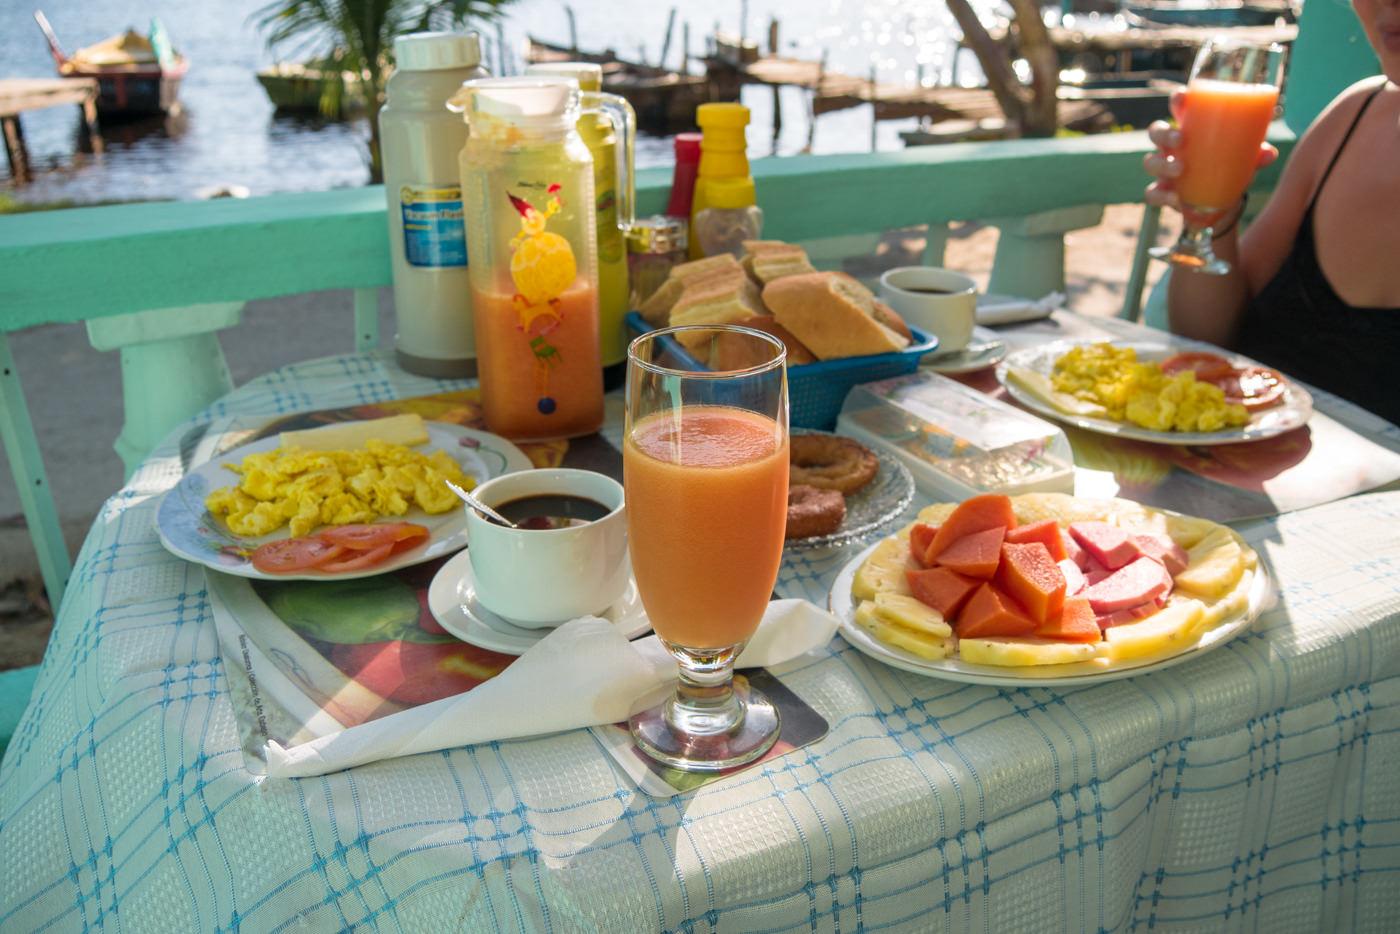 Unser Frühstück in Playa Larga